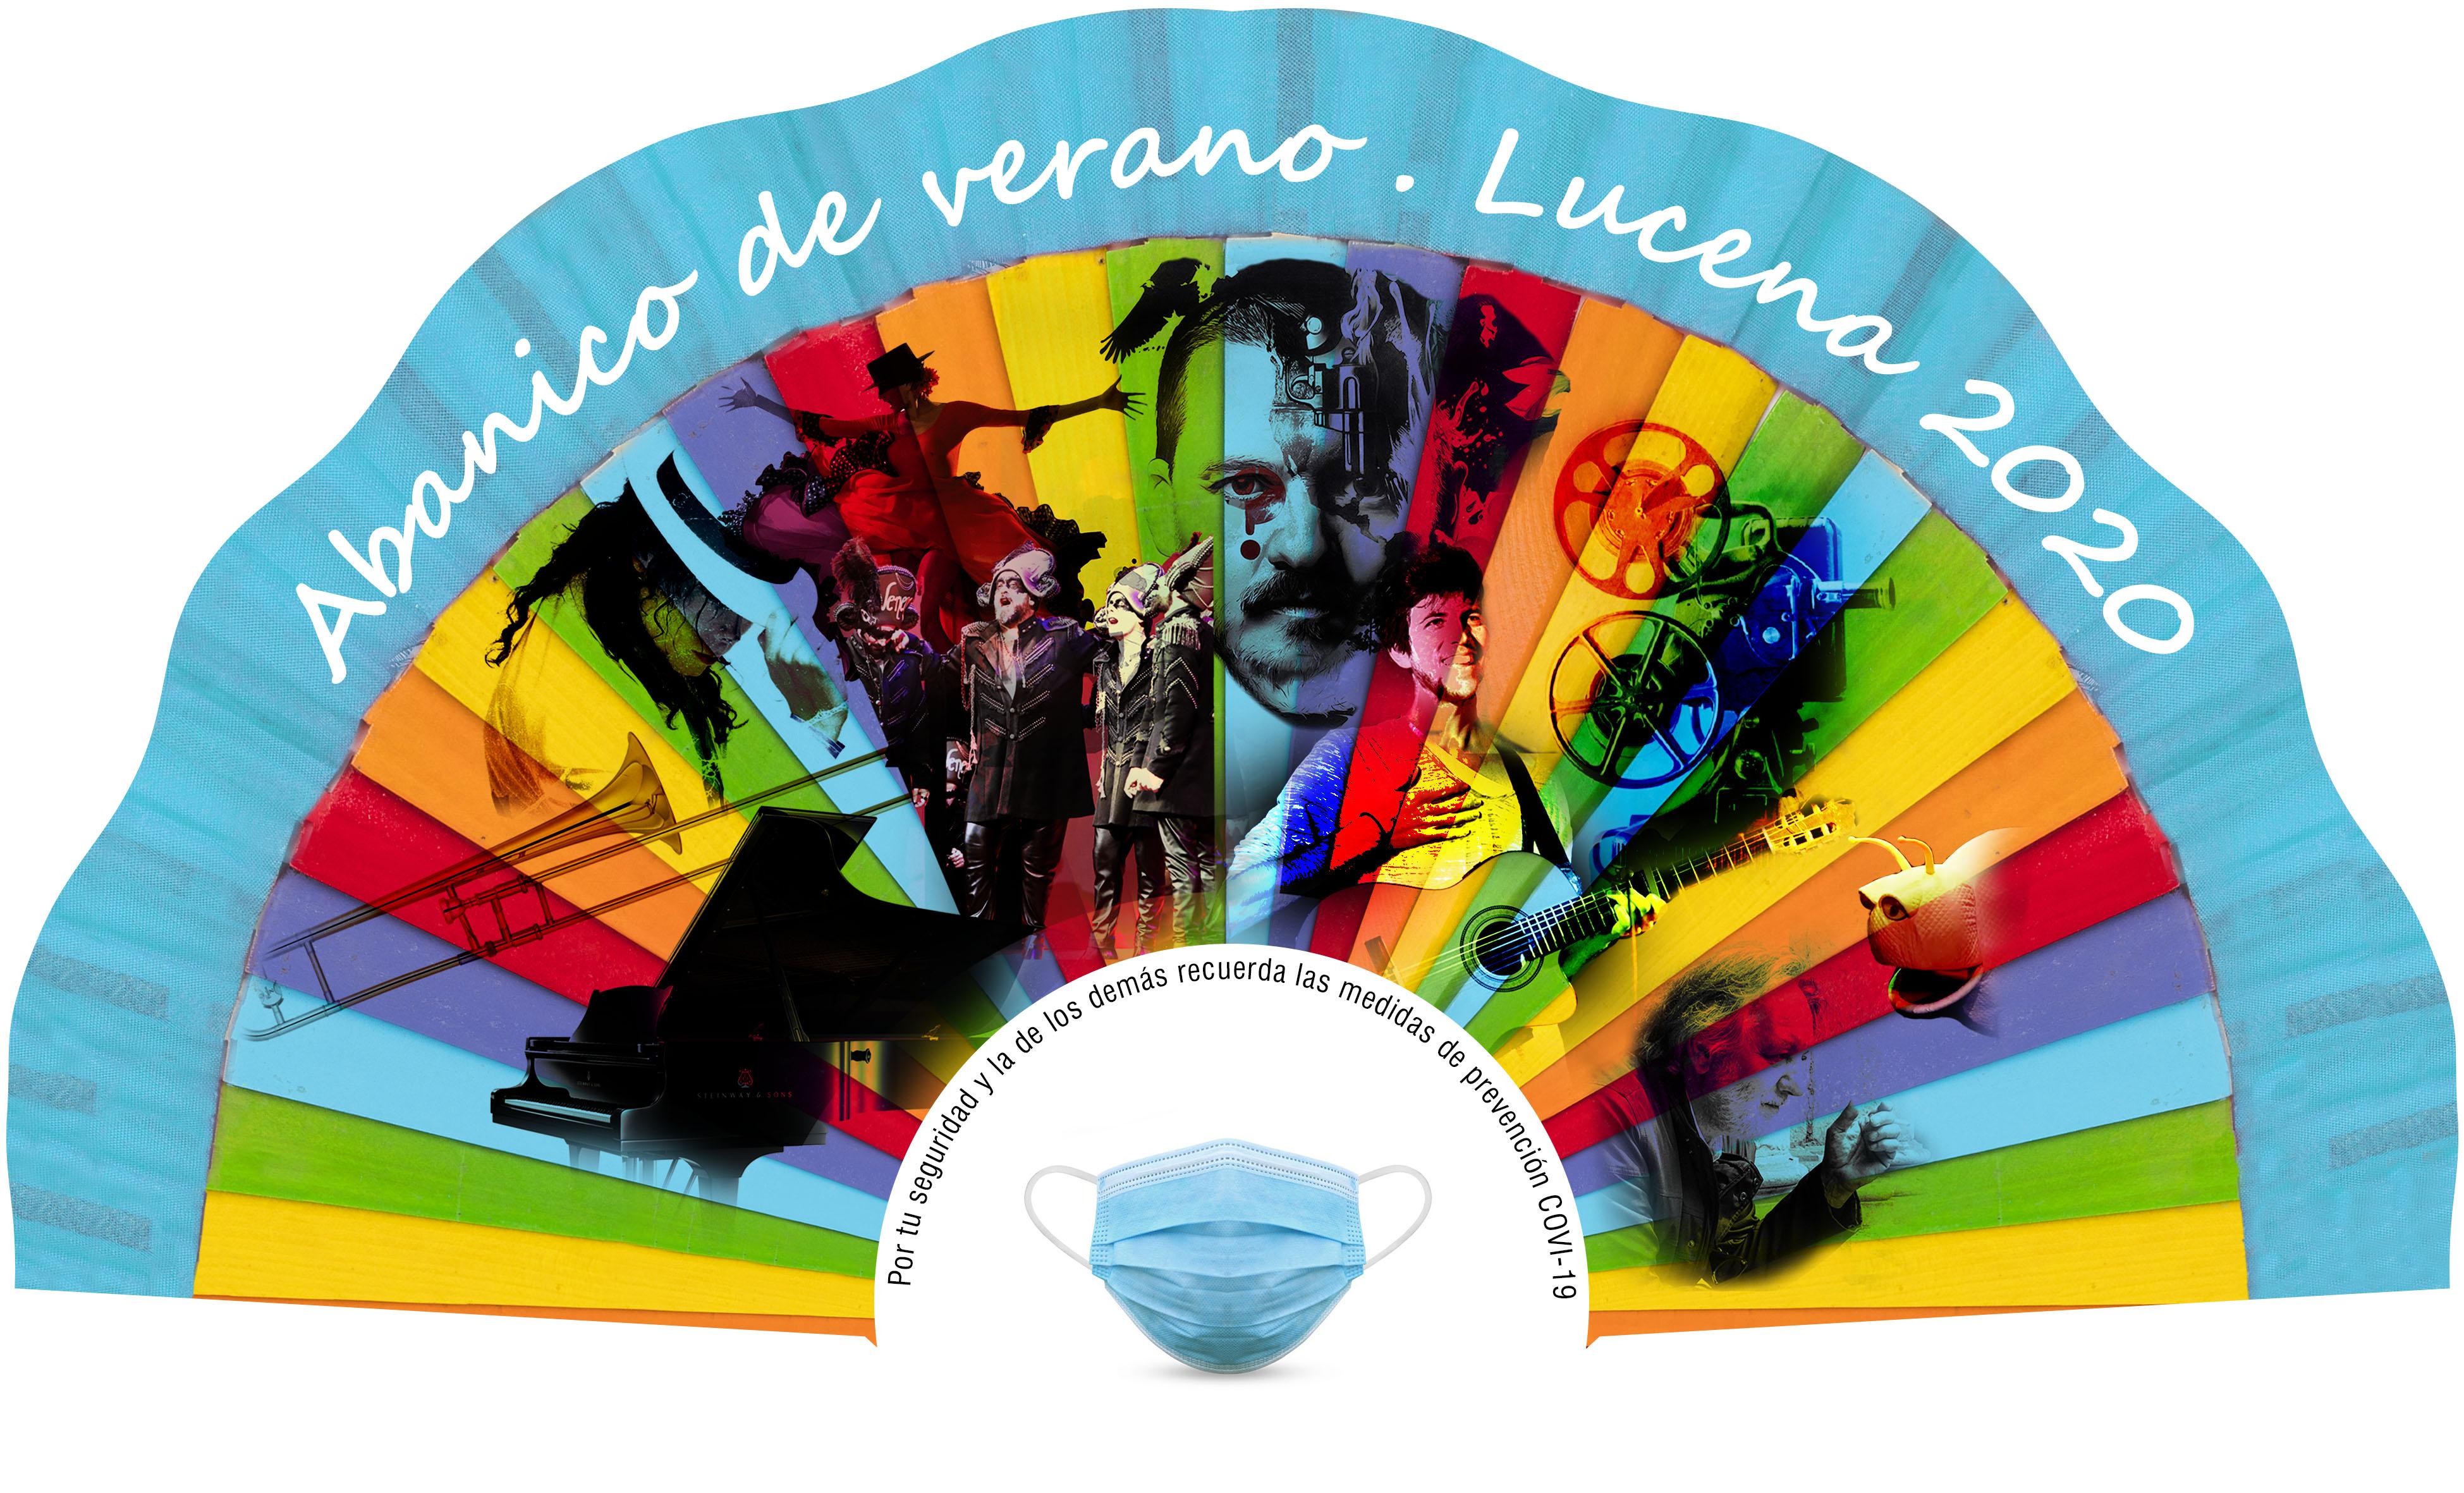 Abanico de verano - Lucena 2020 @ varios espacios